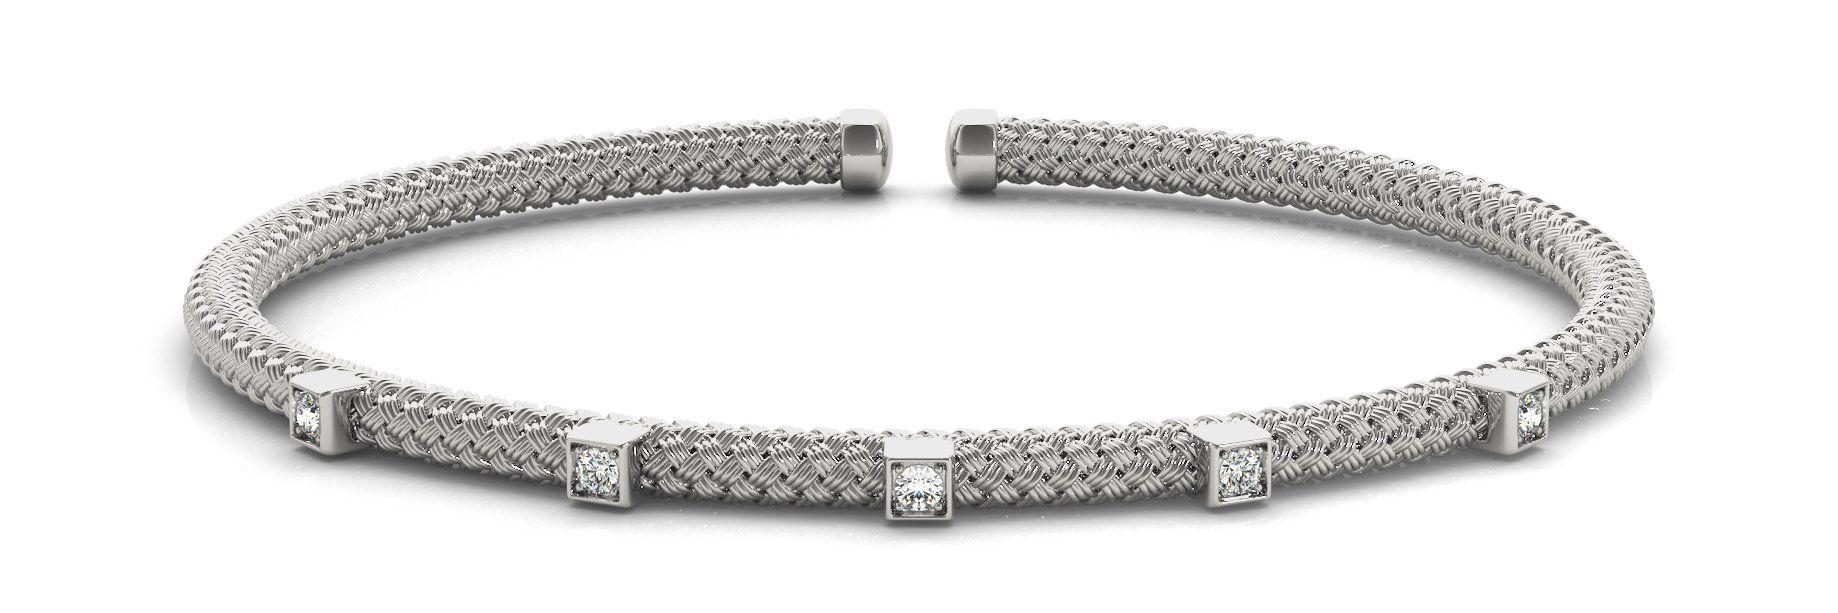 ct diamond bracelet with f color vs clarity diamonds diamond